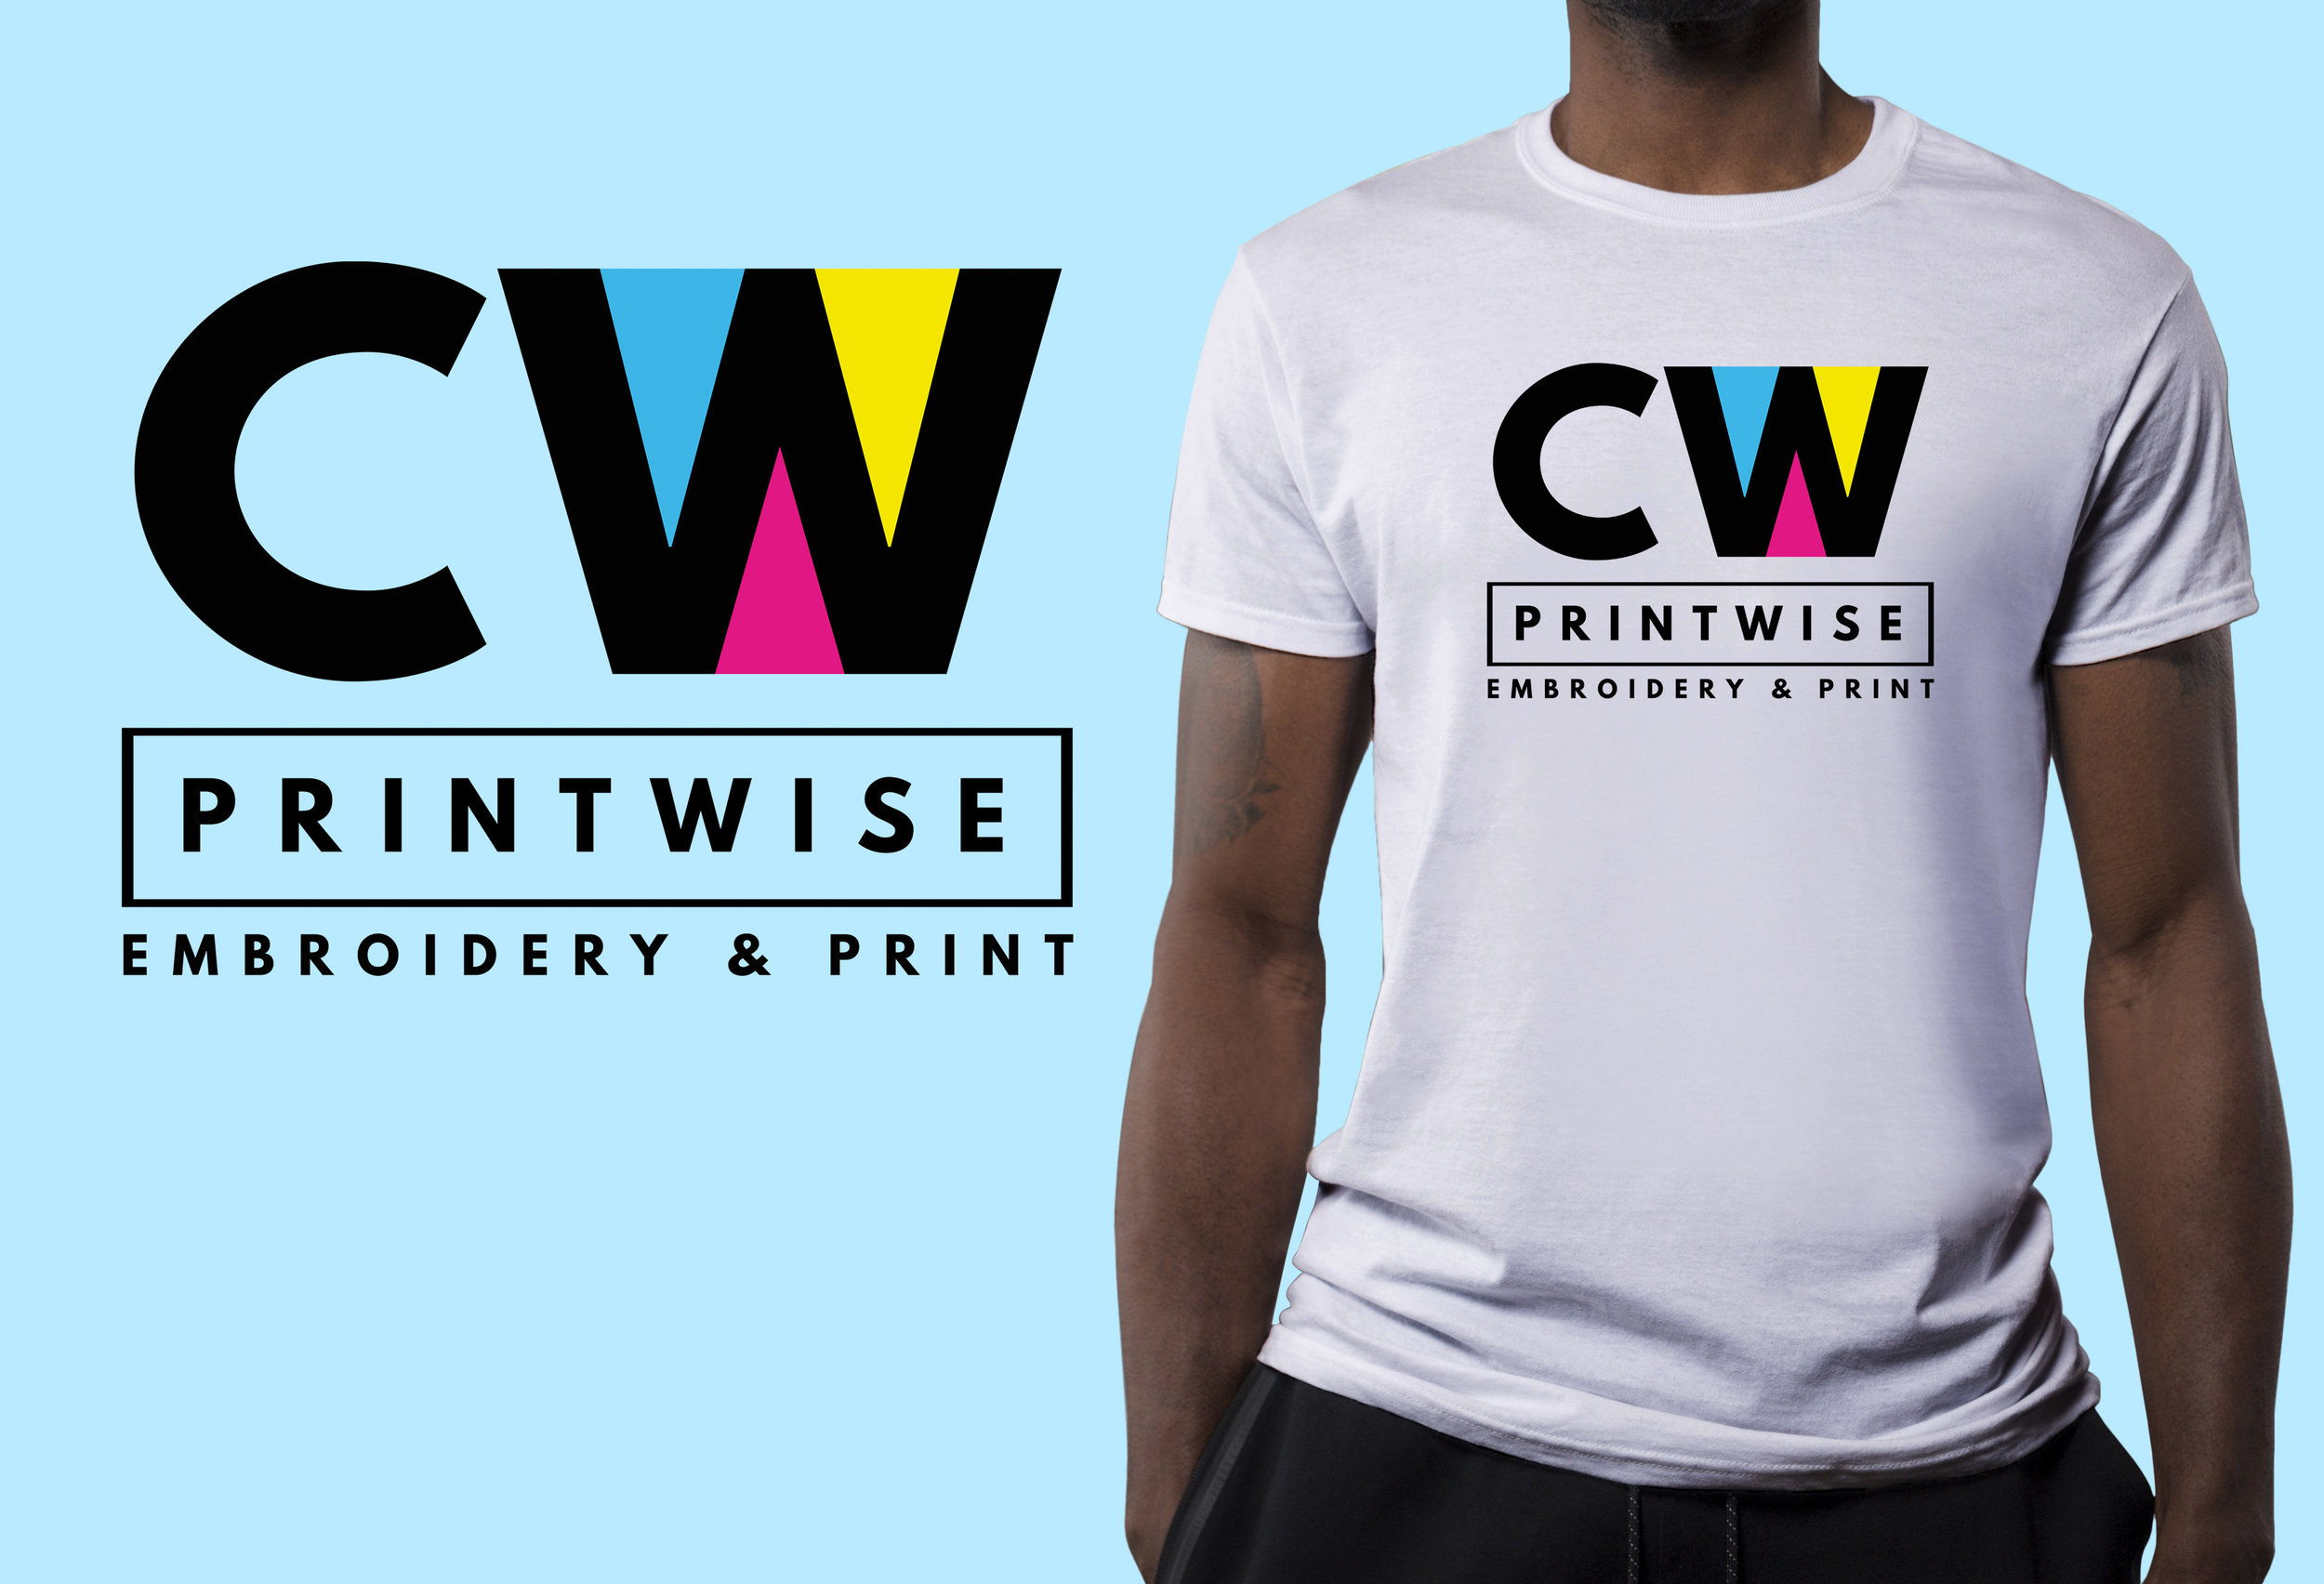 CW Printwise _ DLOVE Design _.jpg